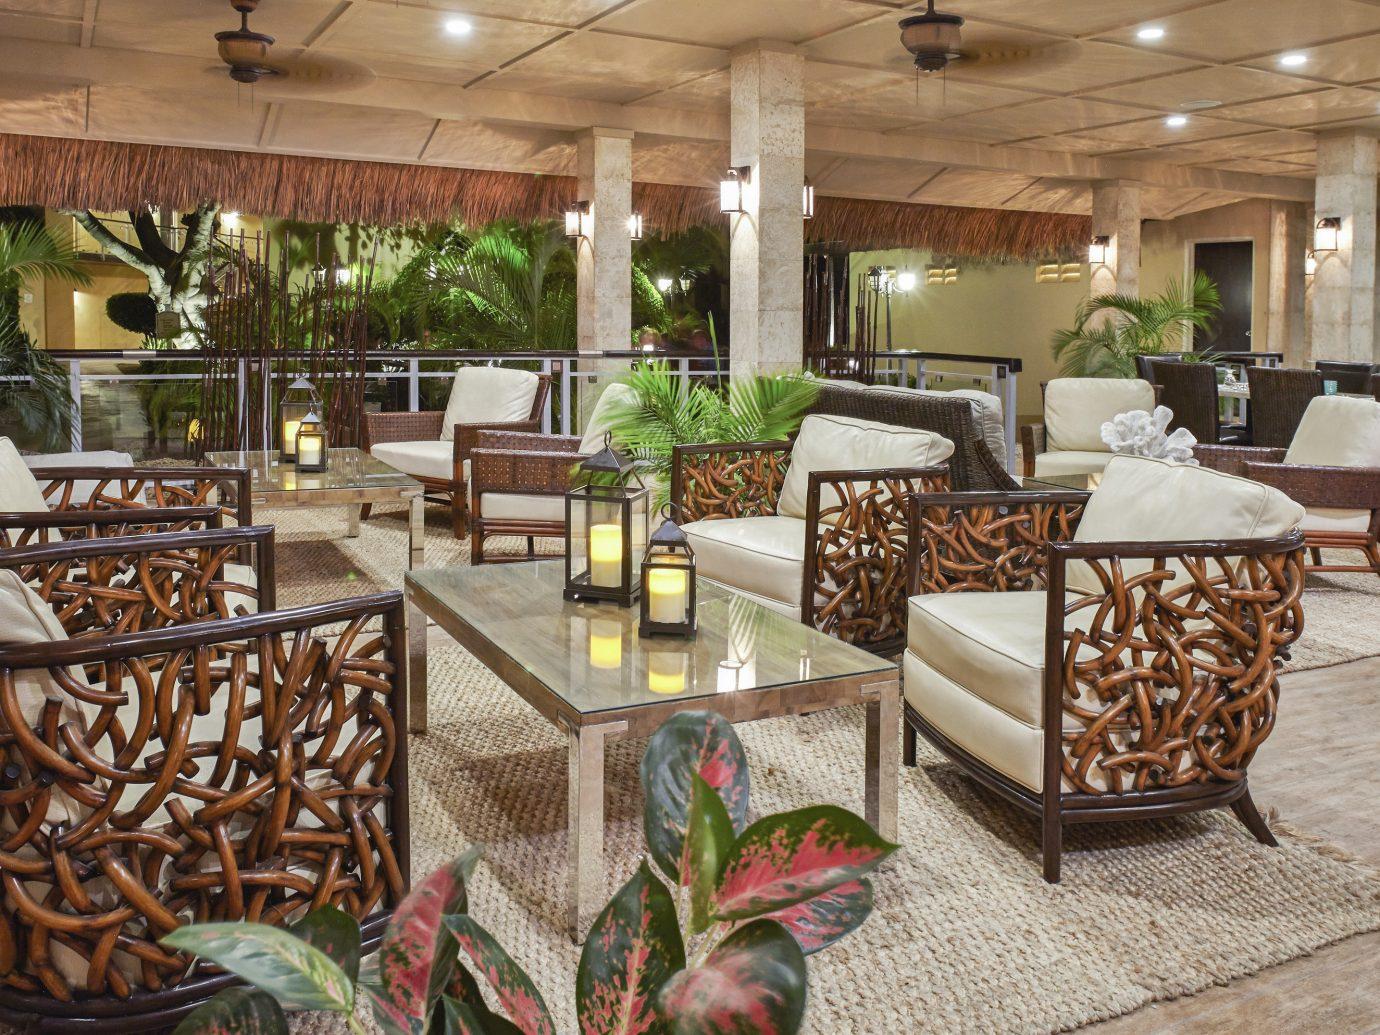 Aruba caribbean Hotels indoor chair floor property Lobby room ceiling estate restaurant home interior design real estate furniture Design area